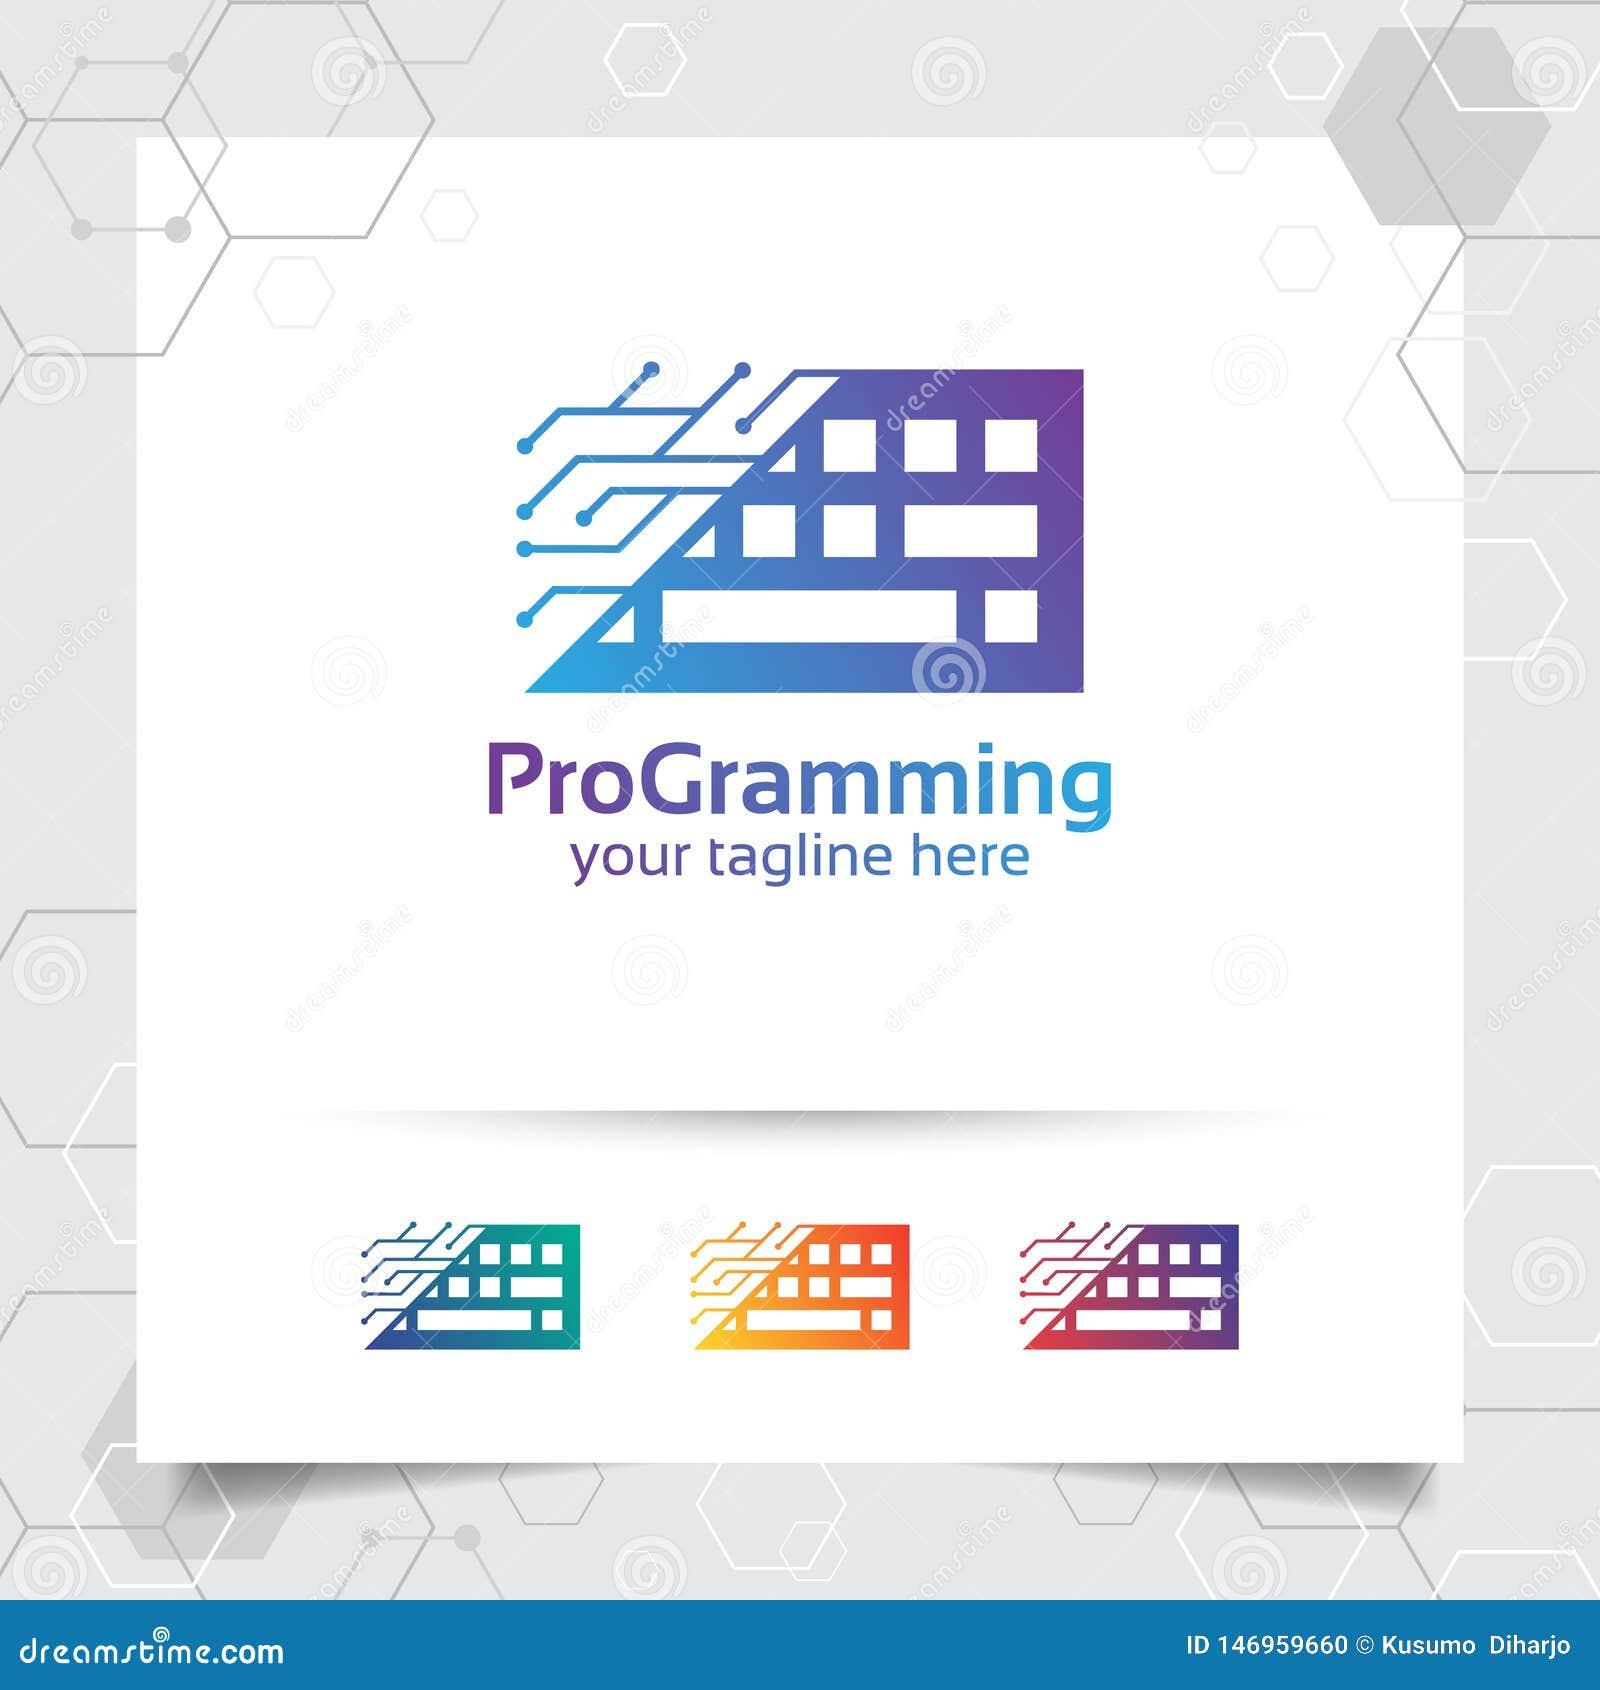 Digital coding logo vector design with concept of keyboard icon and programmer illustration for web development, UI/UX, desktop